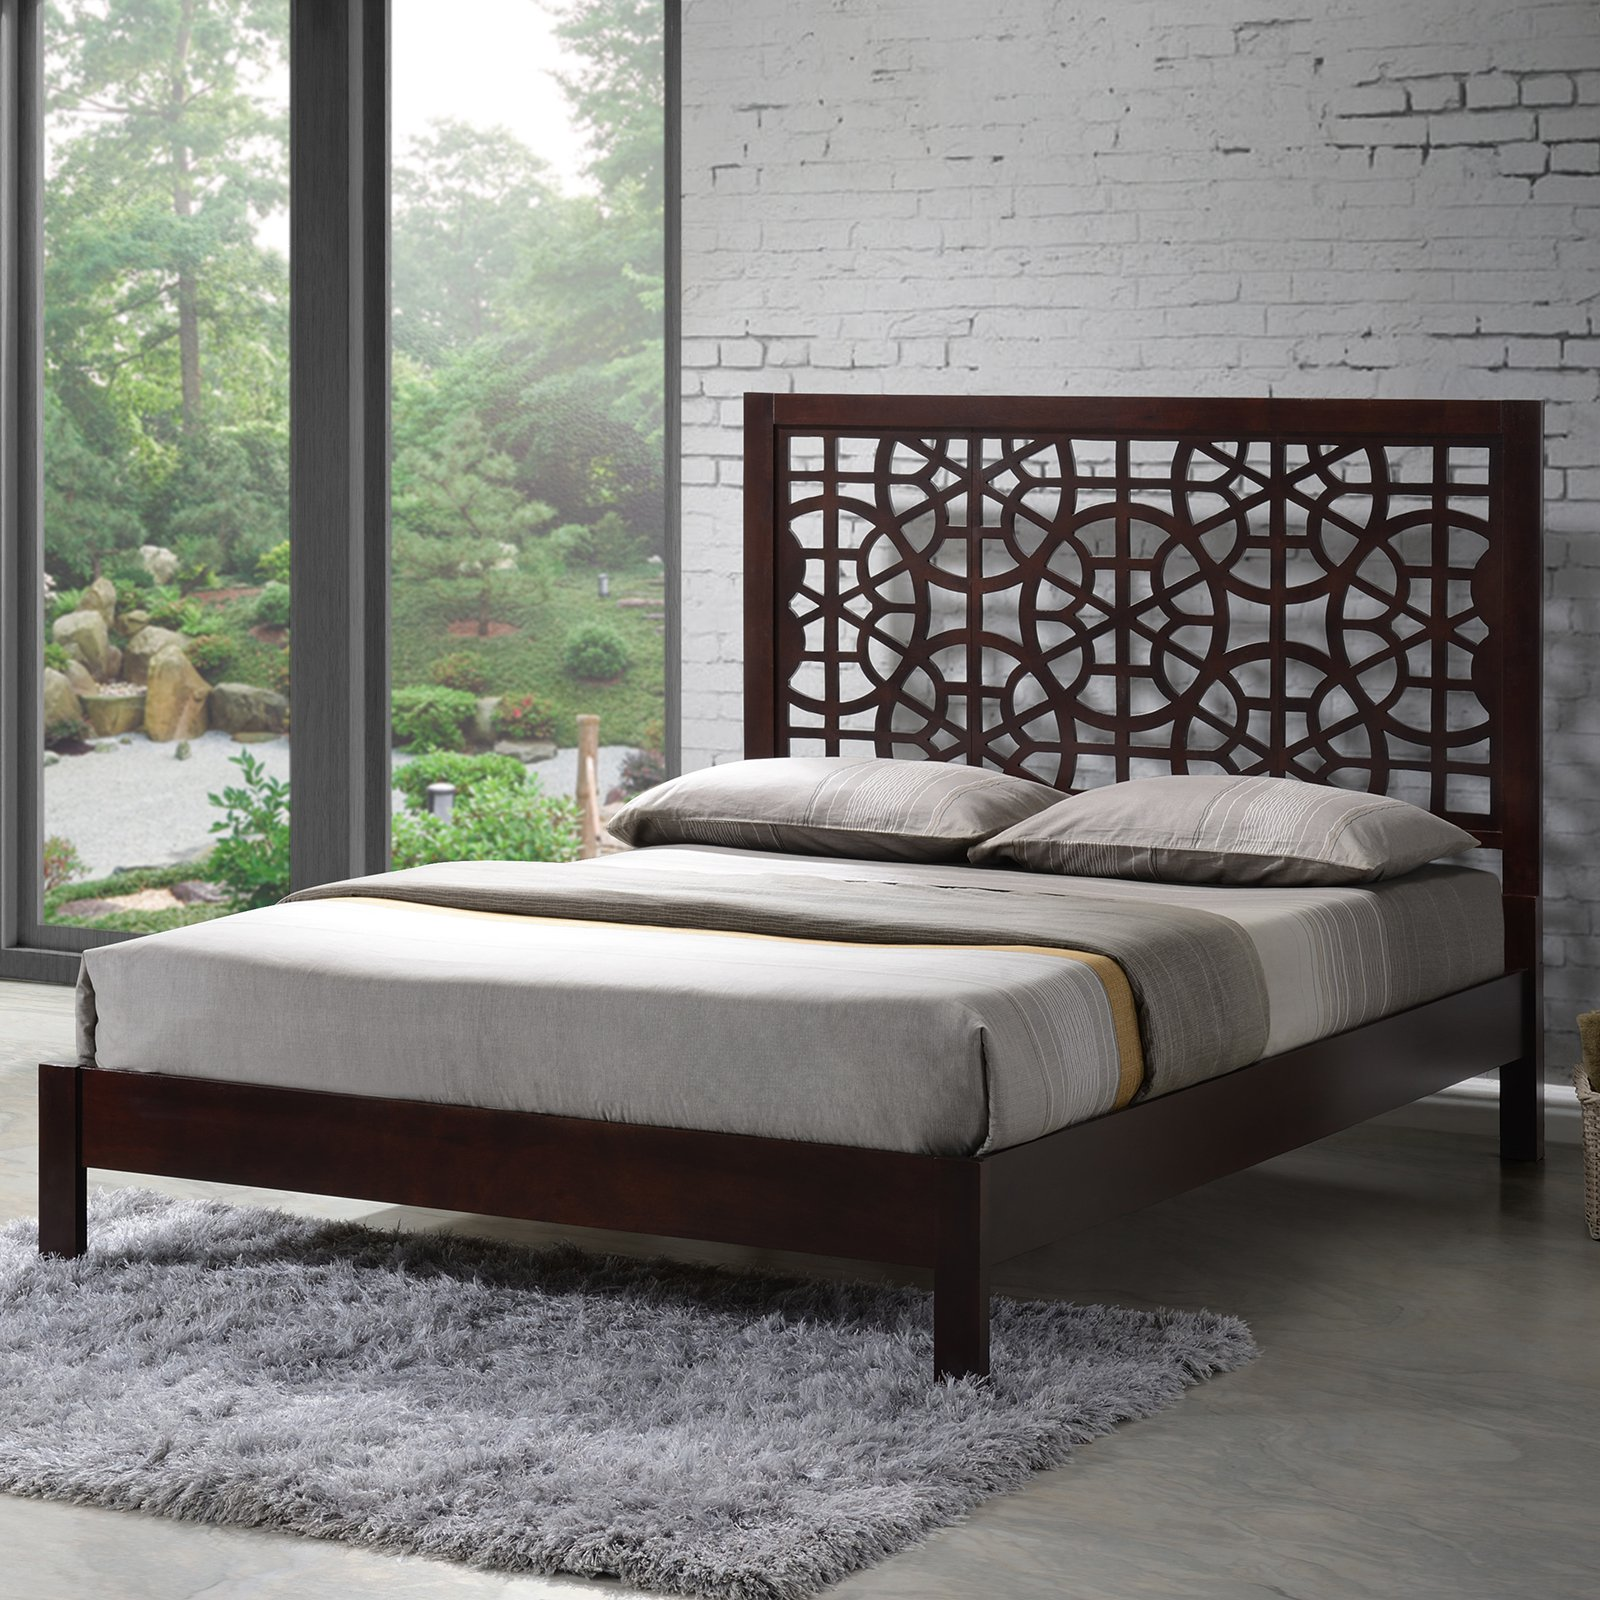 Baxton Studio Sakuro Circle Wood Platform Bed - Cappuccino